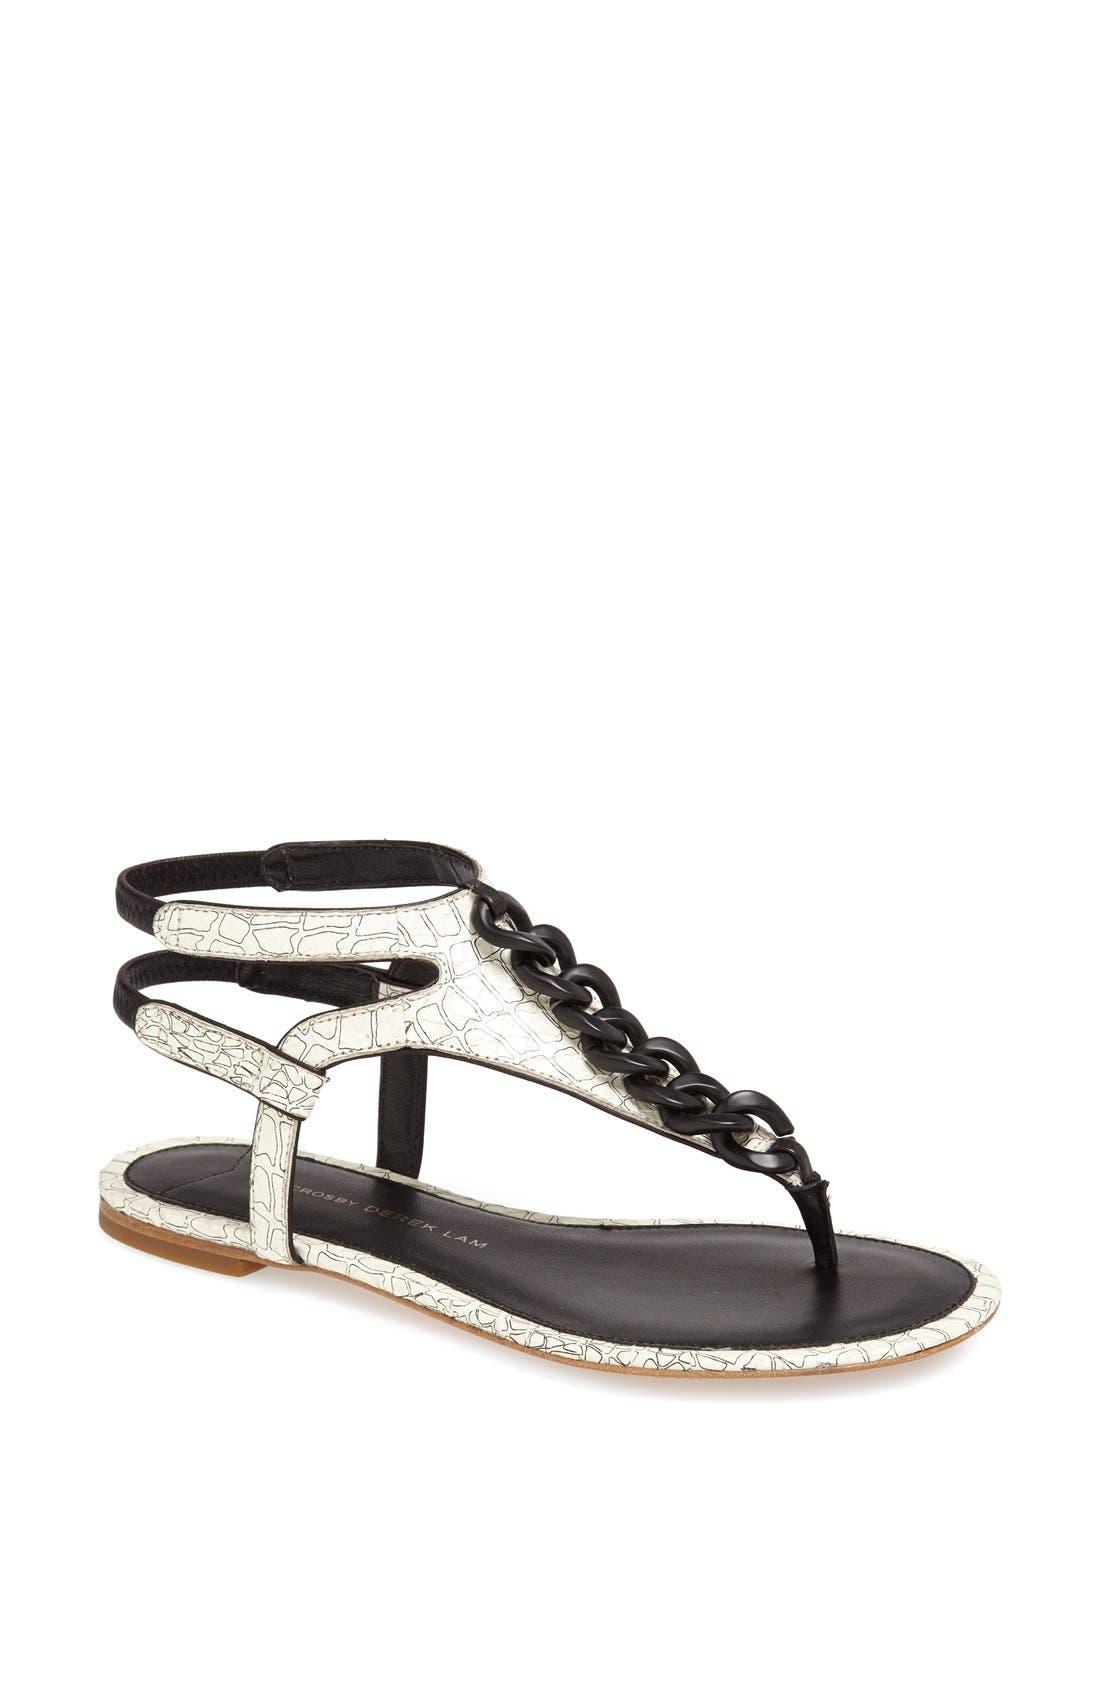 Alternate Image 1 Selected - Derek Lam 10 Crosby 'Damast' Sandal